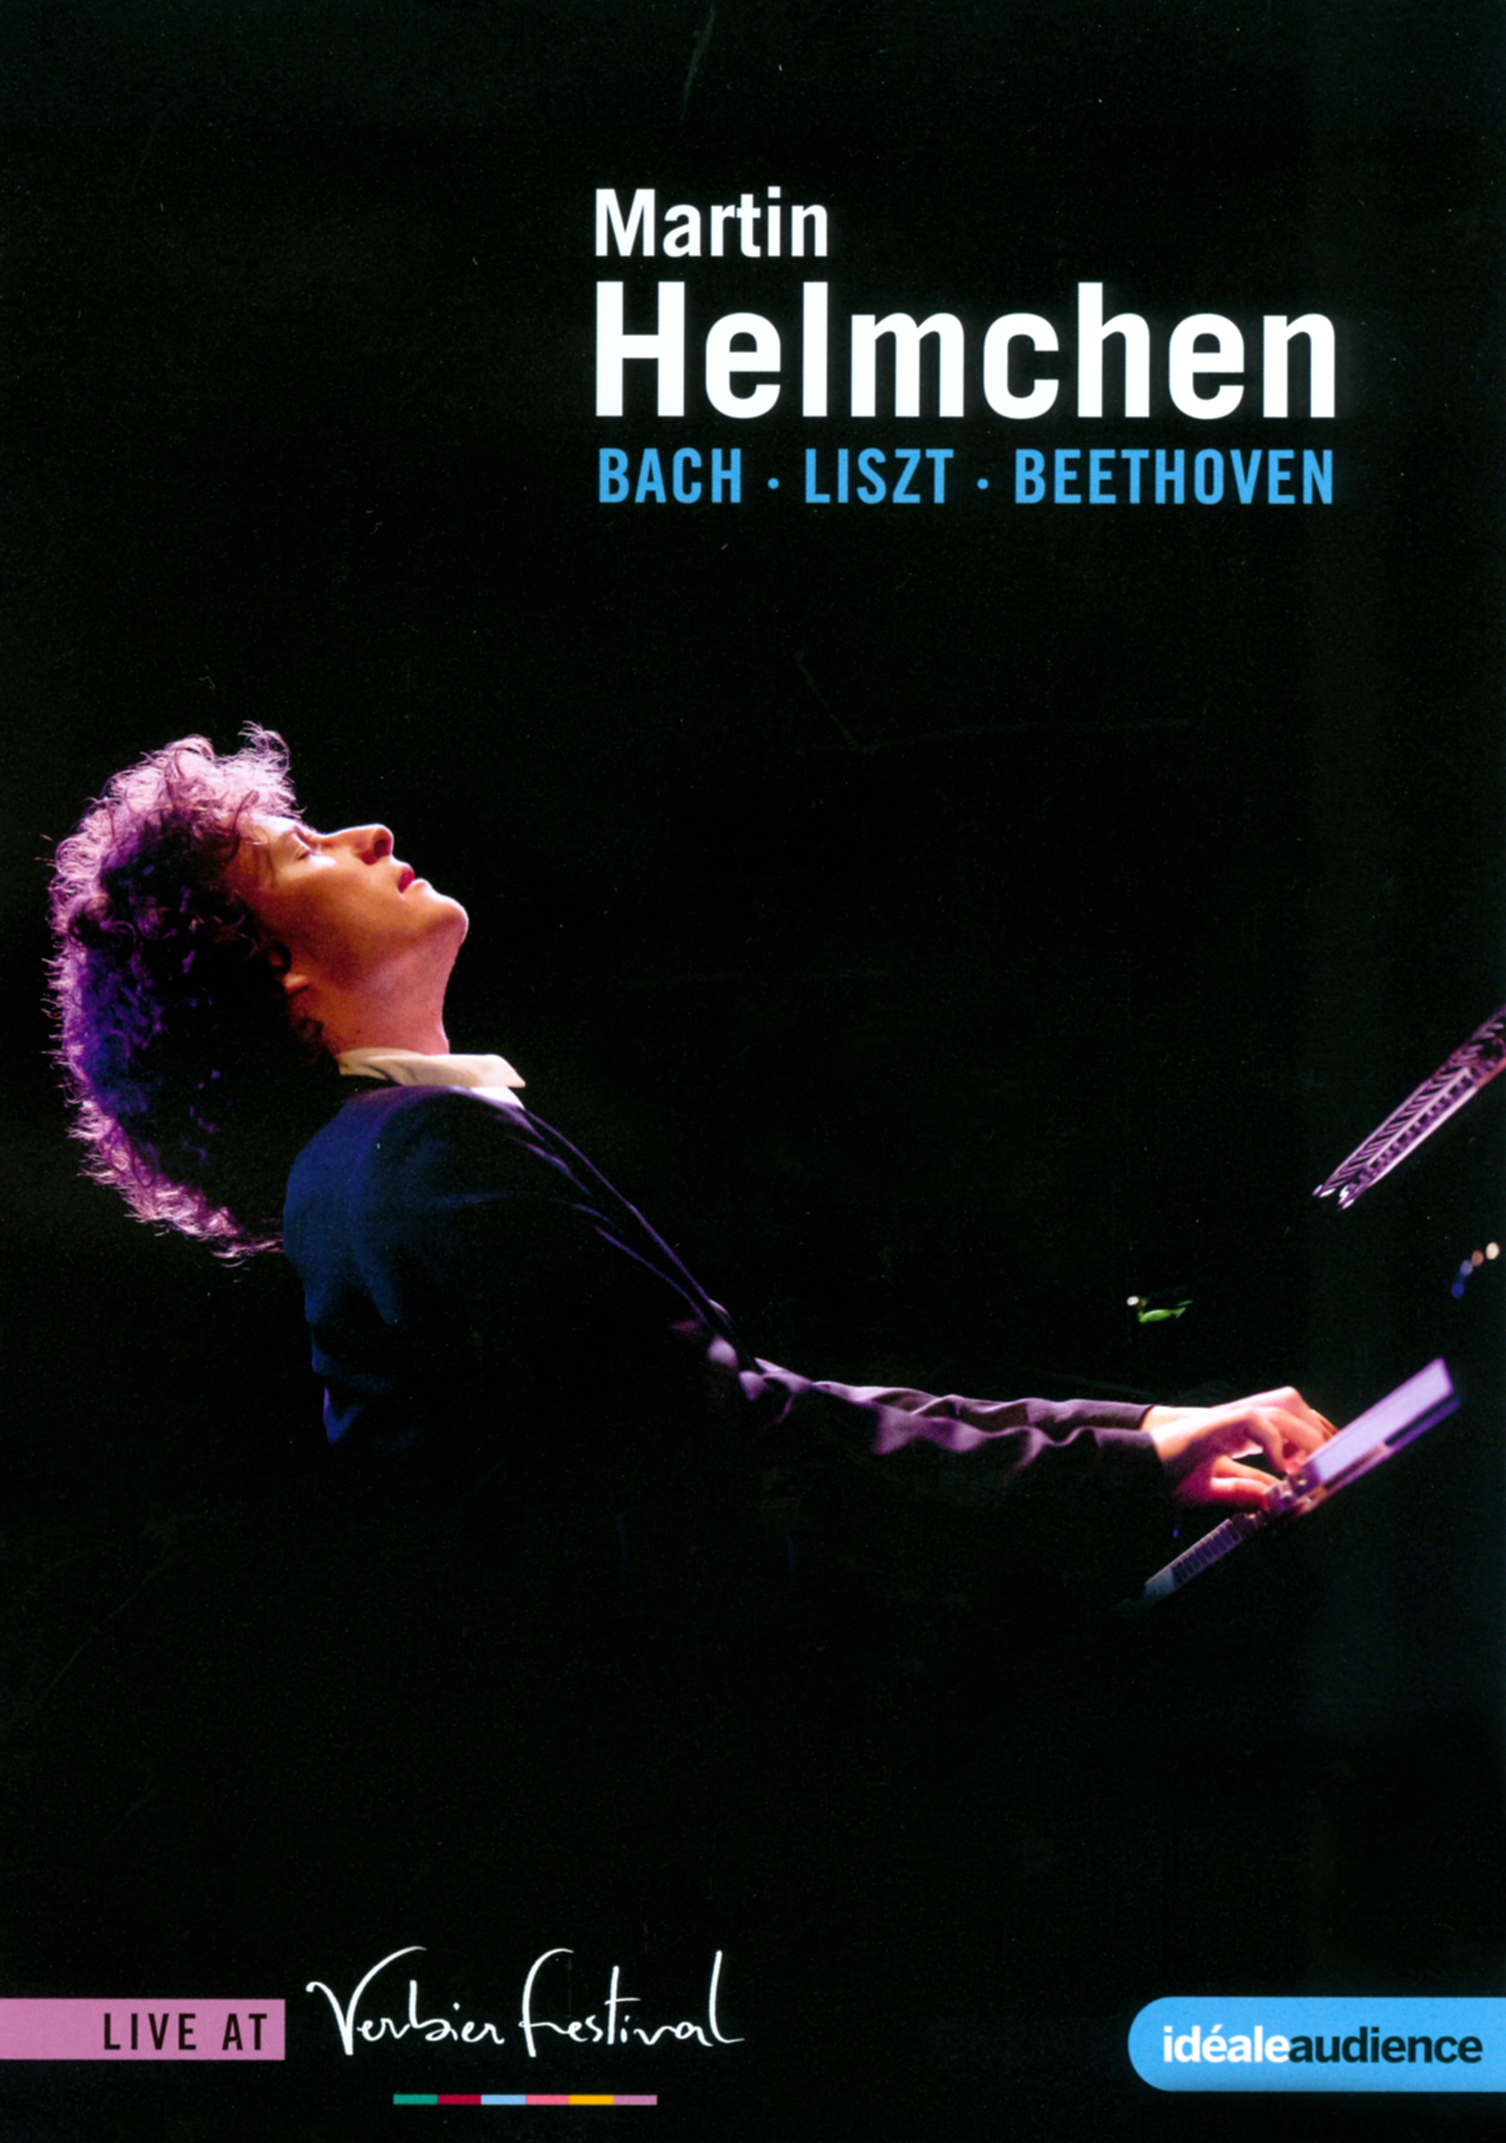 Martin Helmchen: Bach/Liszt/Beethoven - Live at Verbier Festival